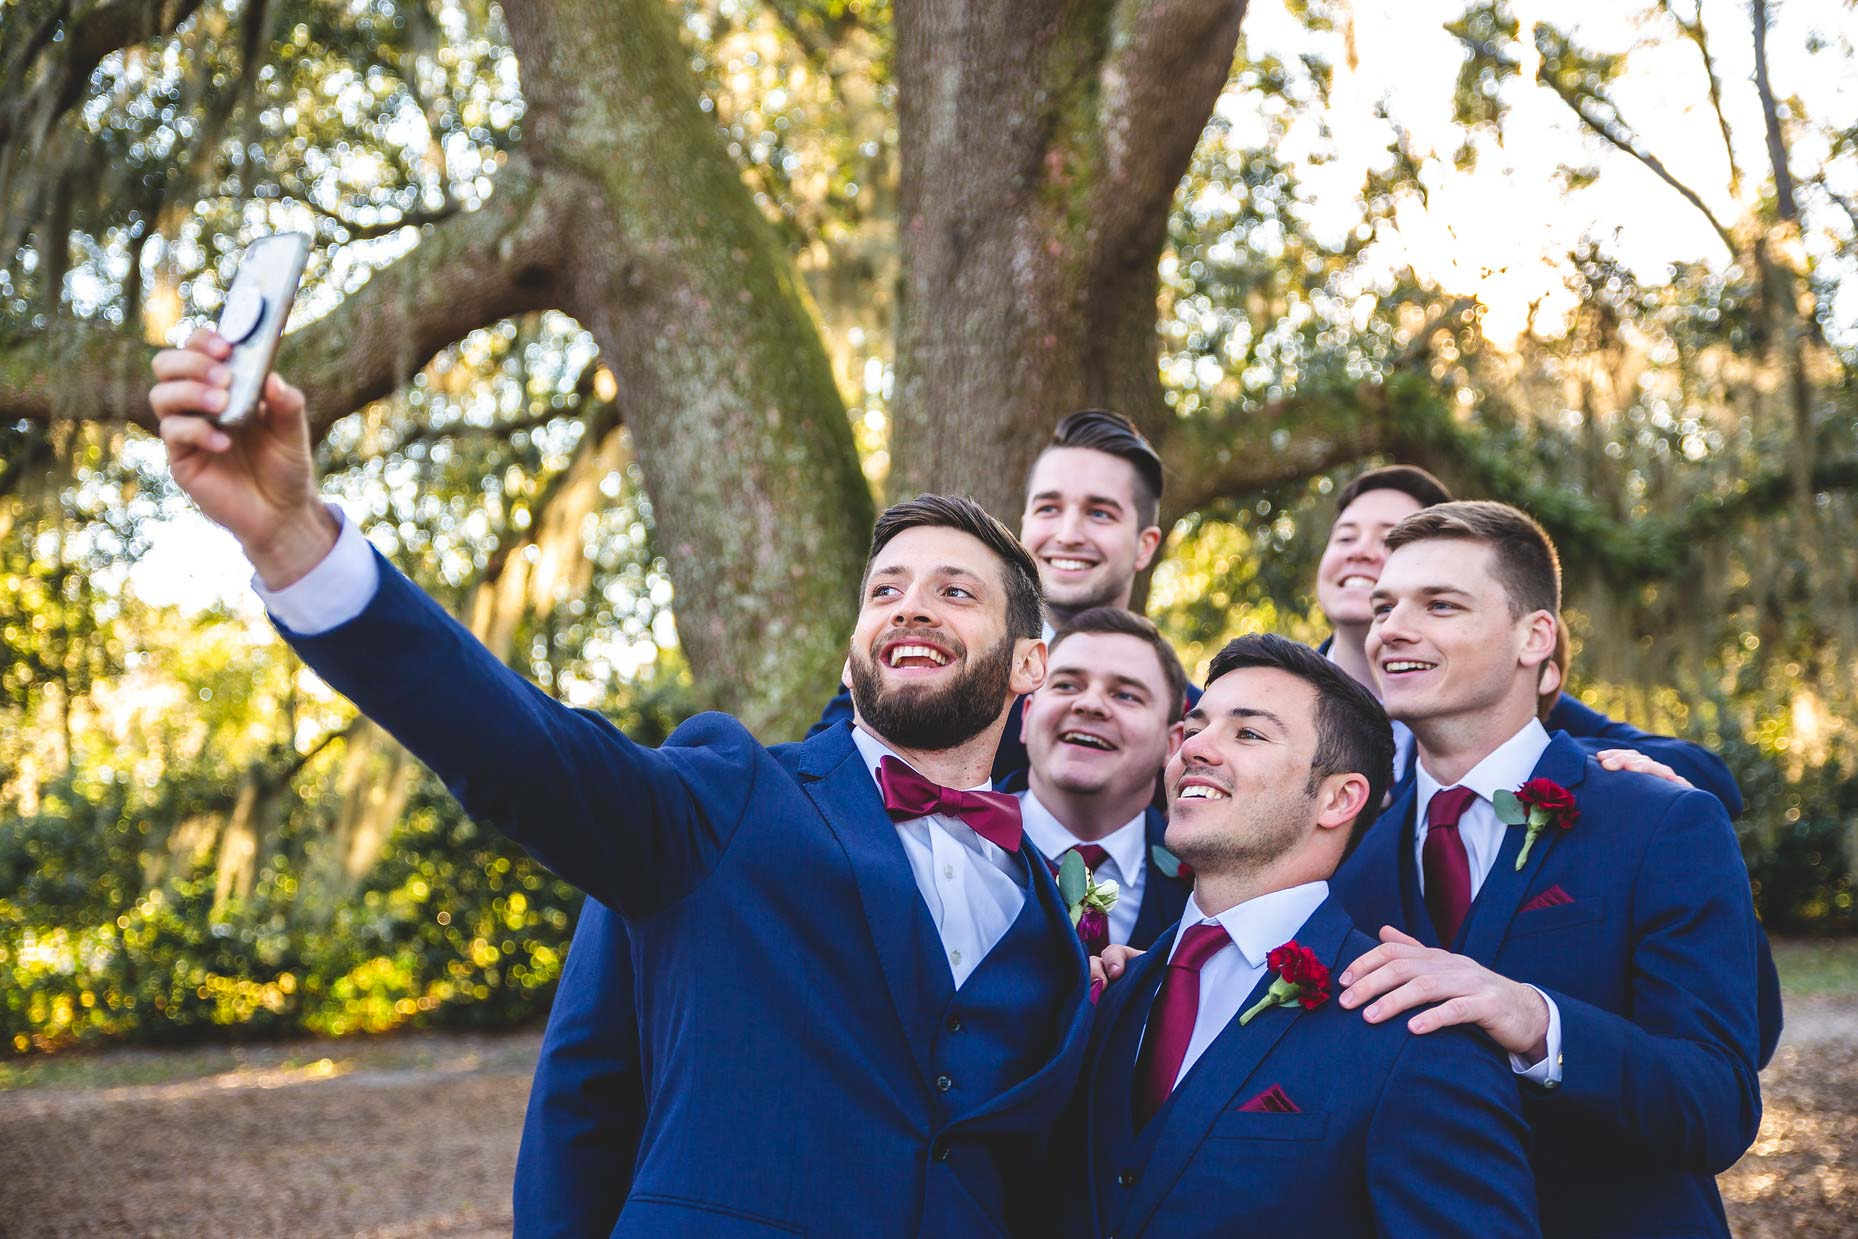 adam-szarmack-bowing-oaks-wedding-photographer-jacksonville-93.jpg